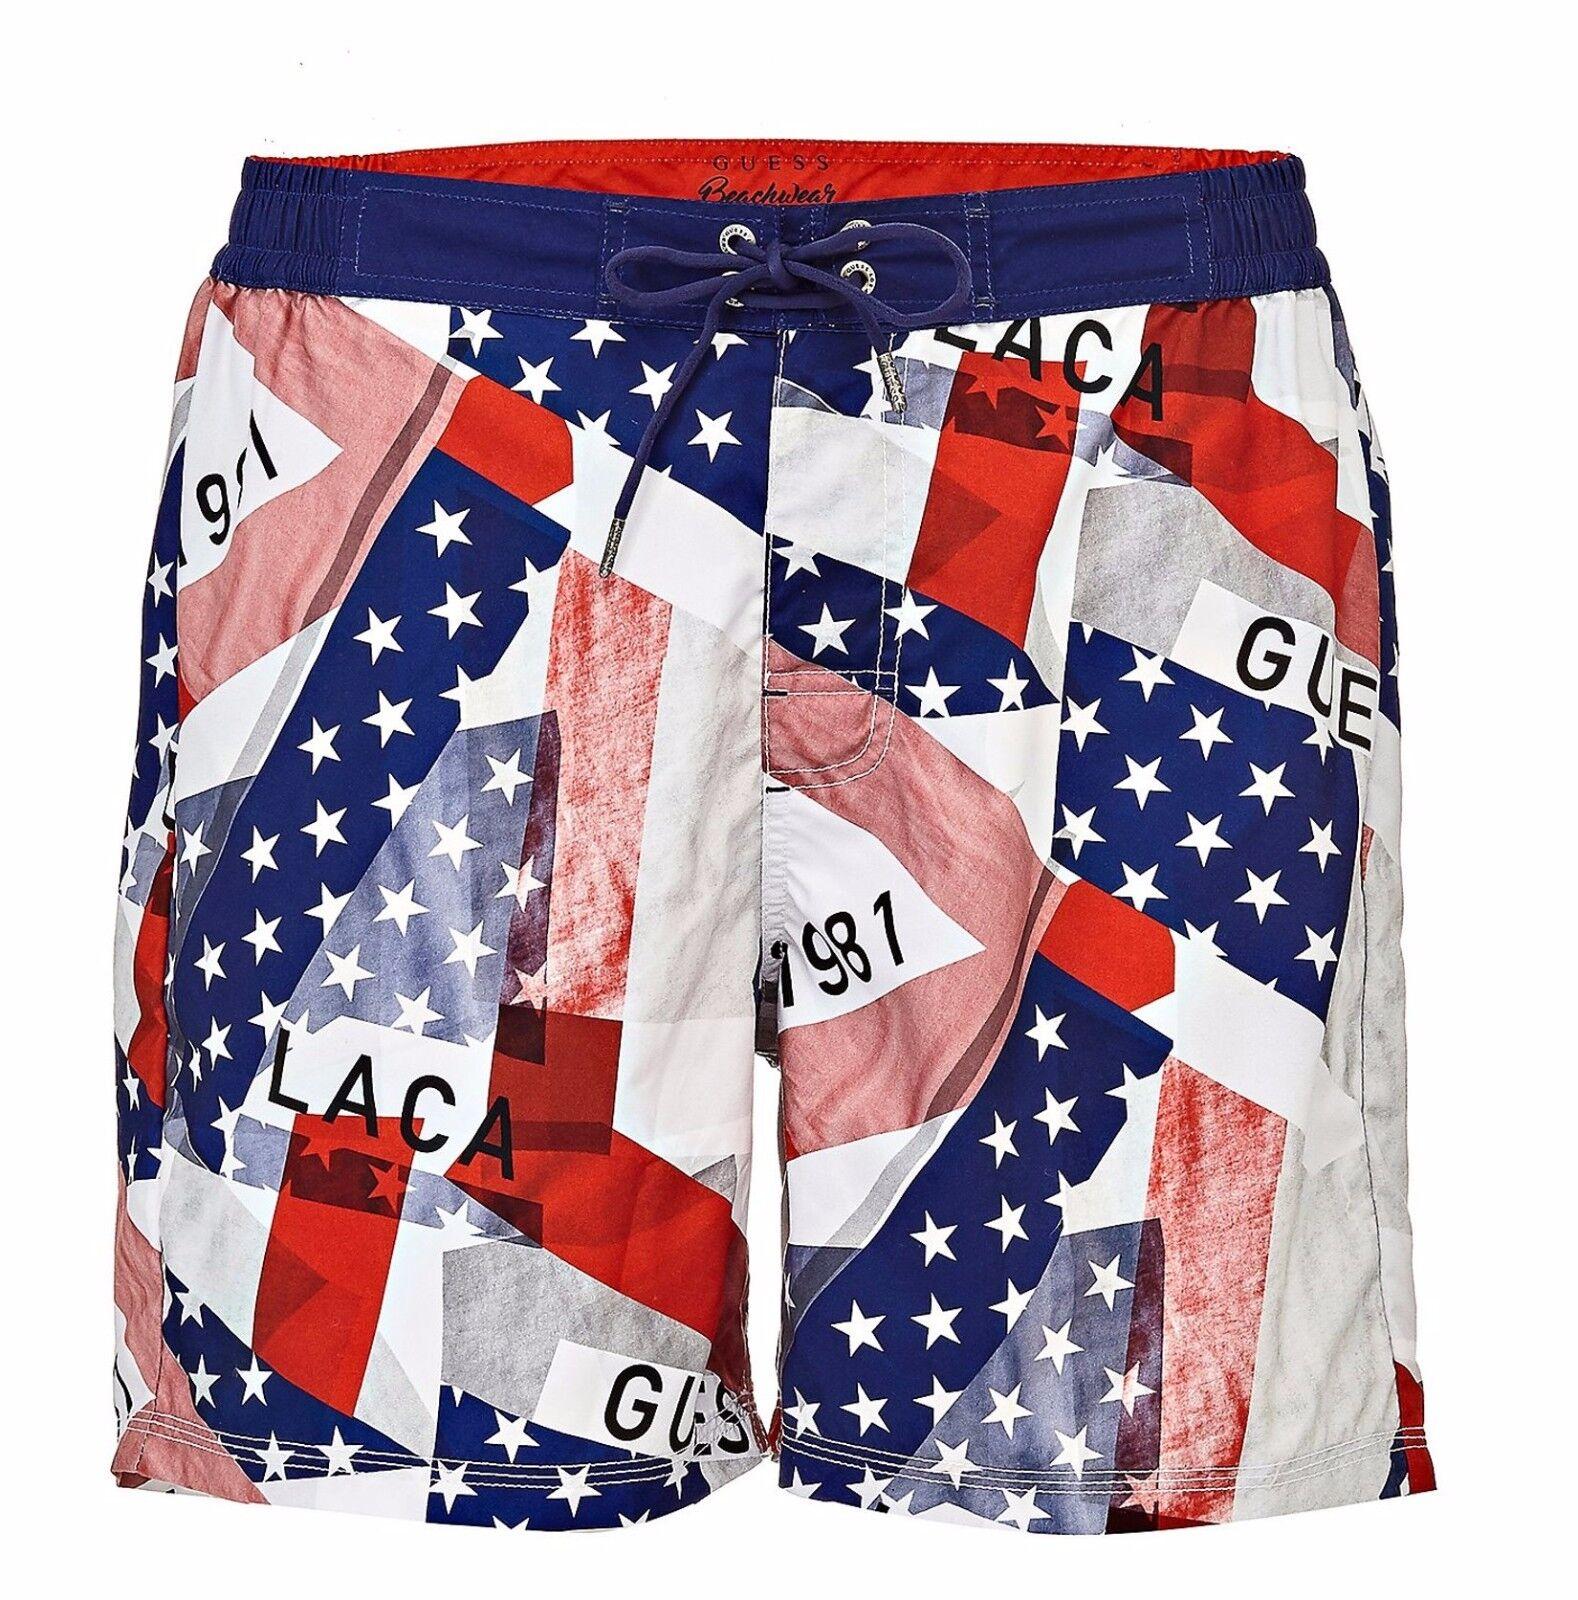 Guess Men's Swimming Trunks Shorts F74t02